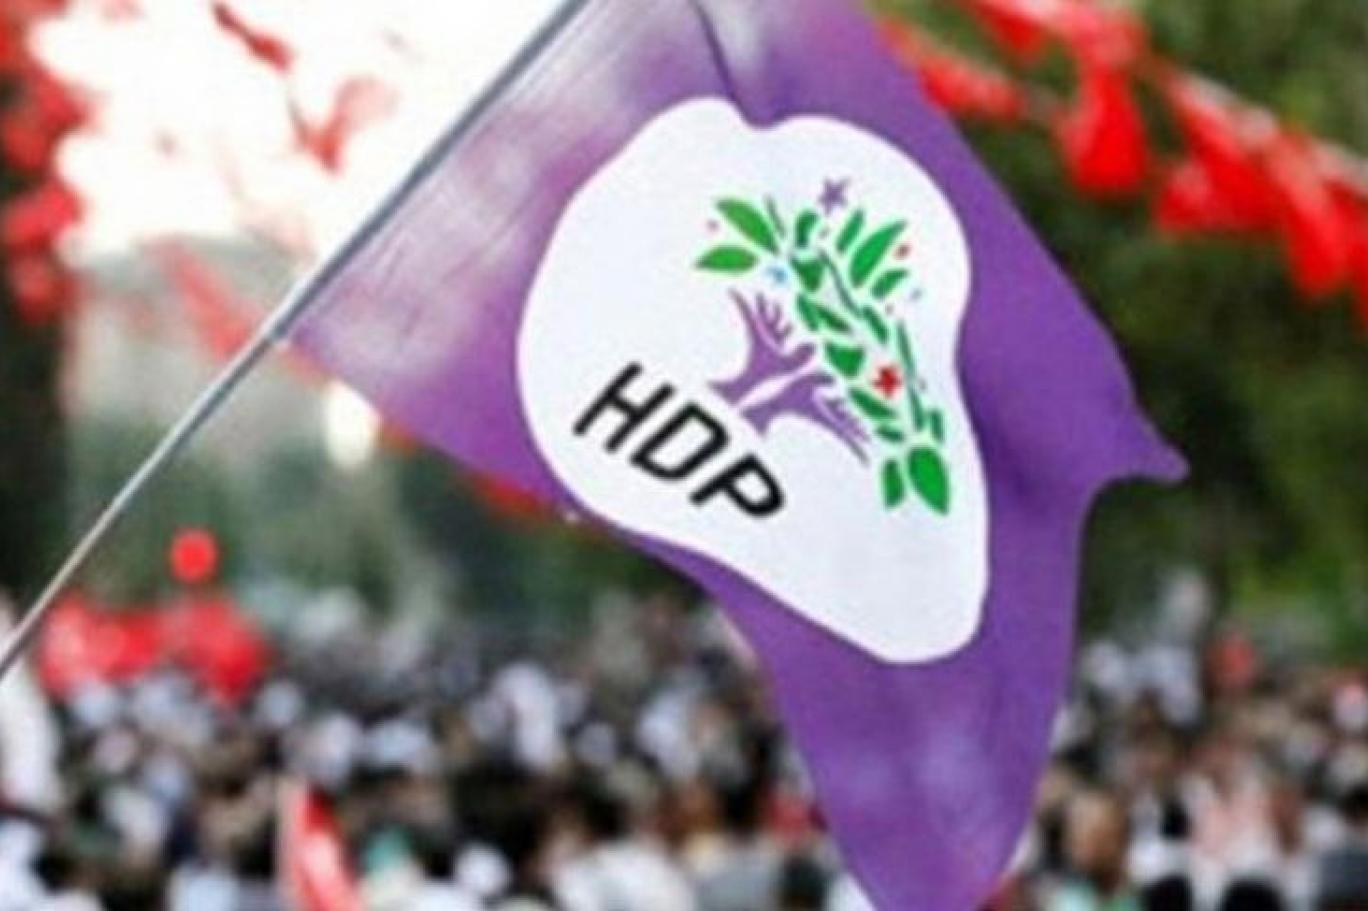 HDP kapatılacak mı? Kritik tarih 31 Mart